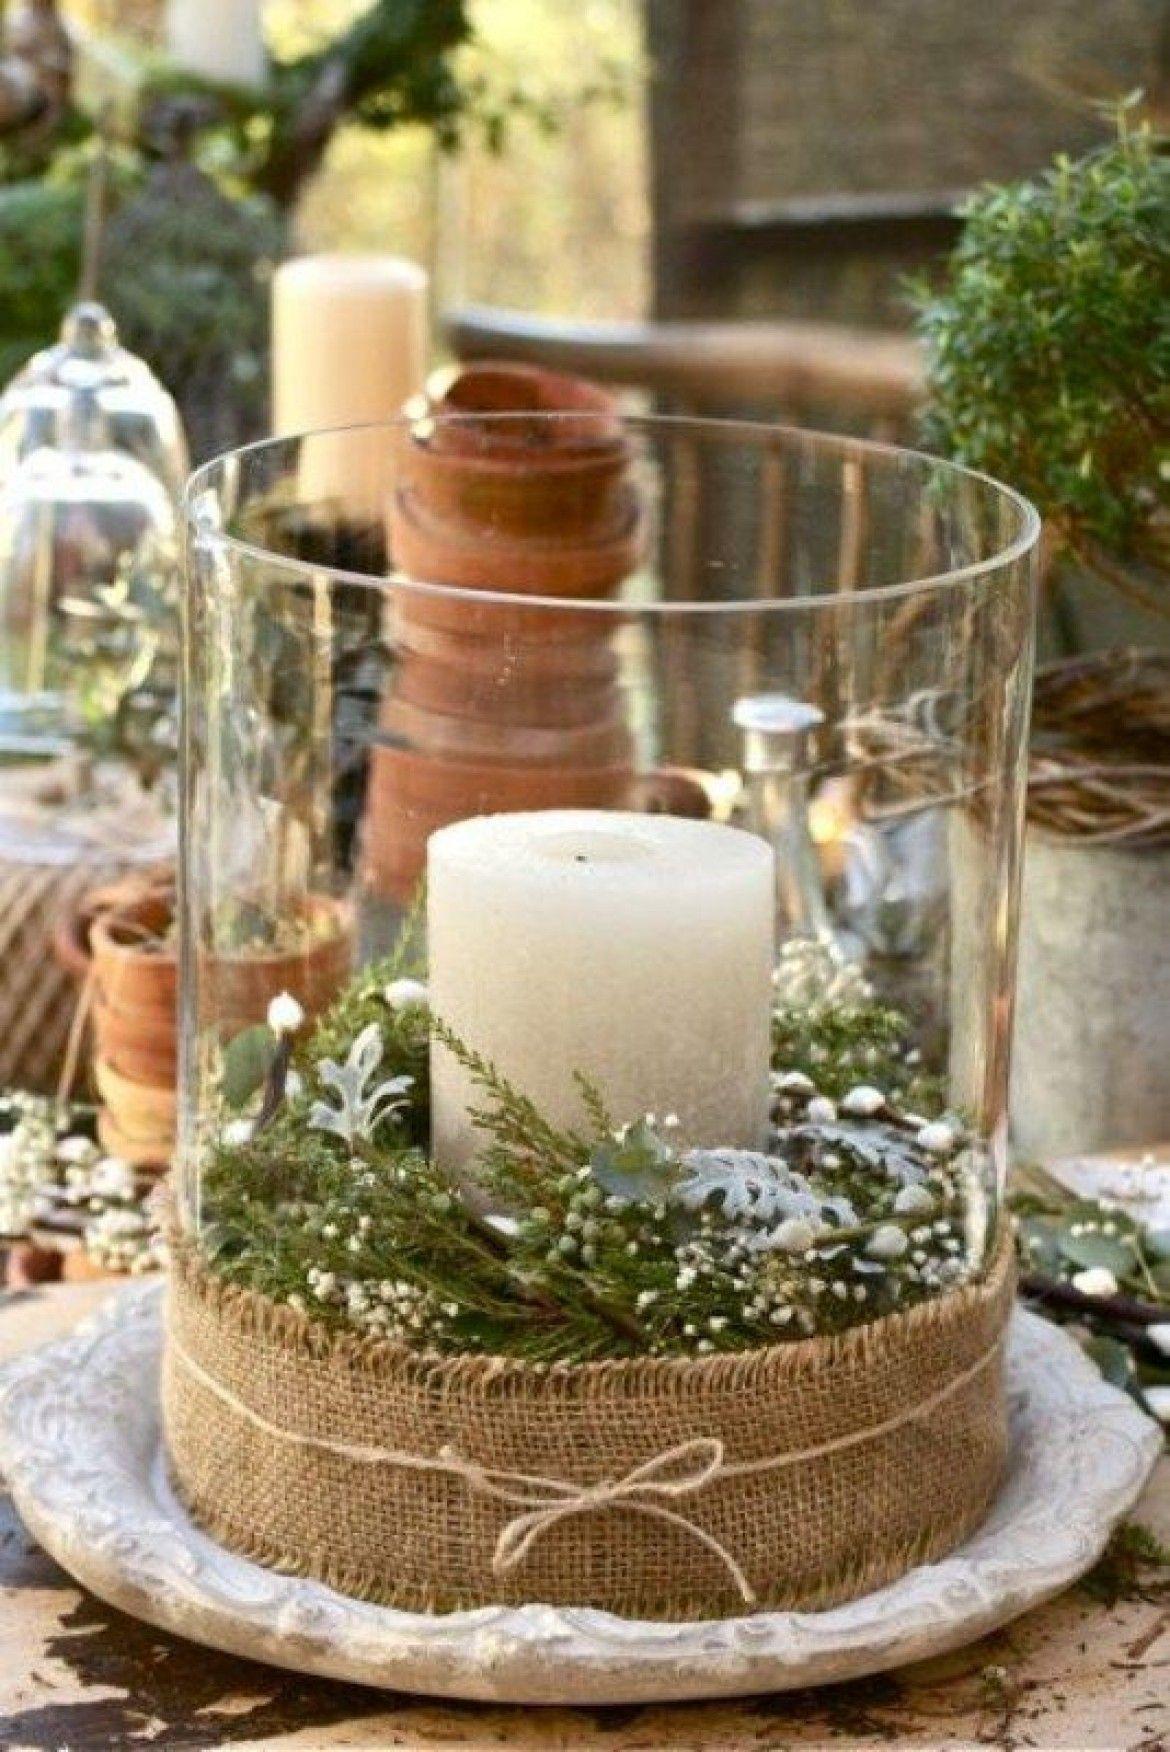 Christmas Candle Centerpiece Ideas Evergreen And Candle Centrepiece  Decor  Pinterest  Christmas